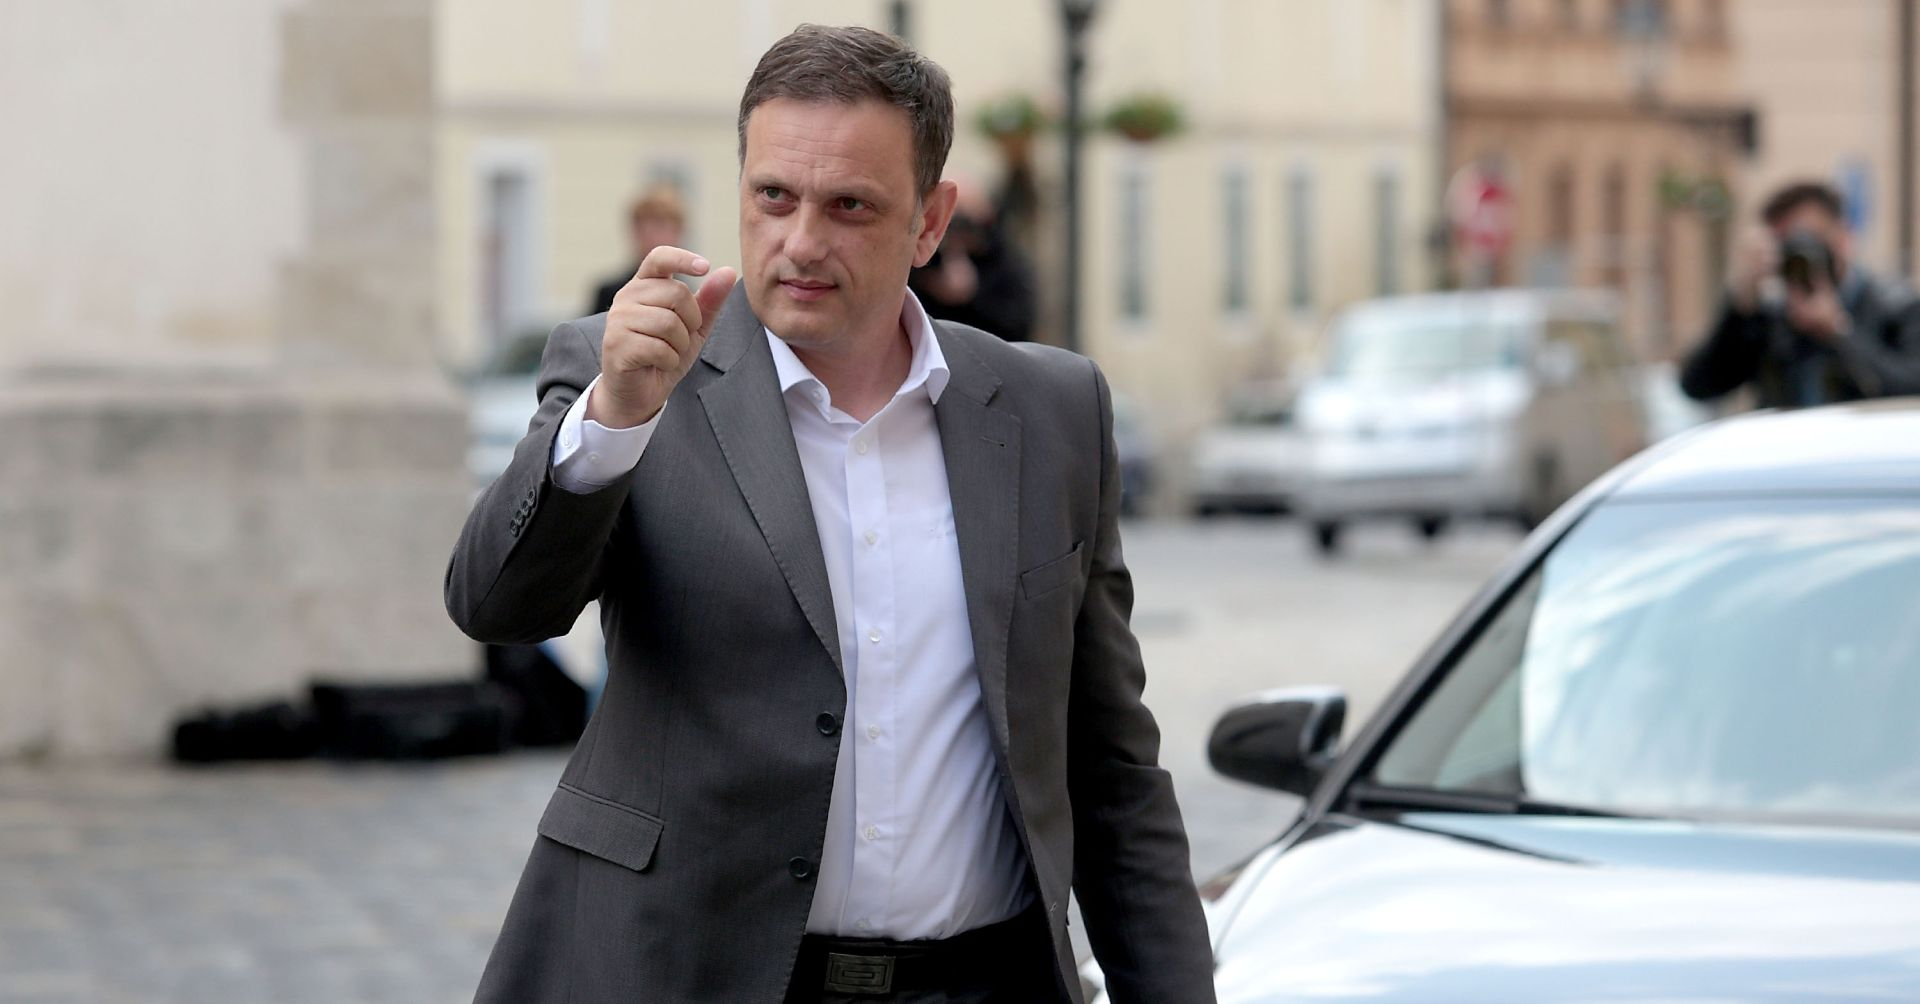 Ministar Kliman uvučen u aferu zbog zgrade u centru Zagreba